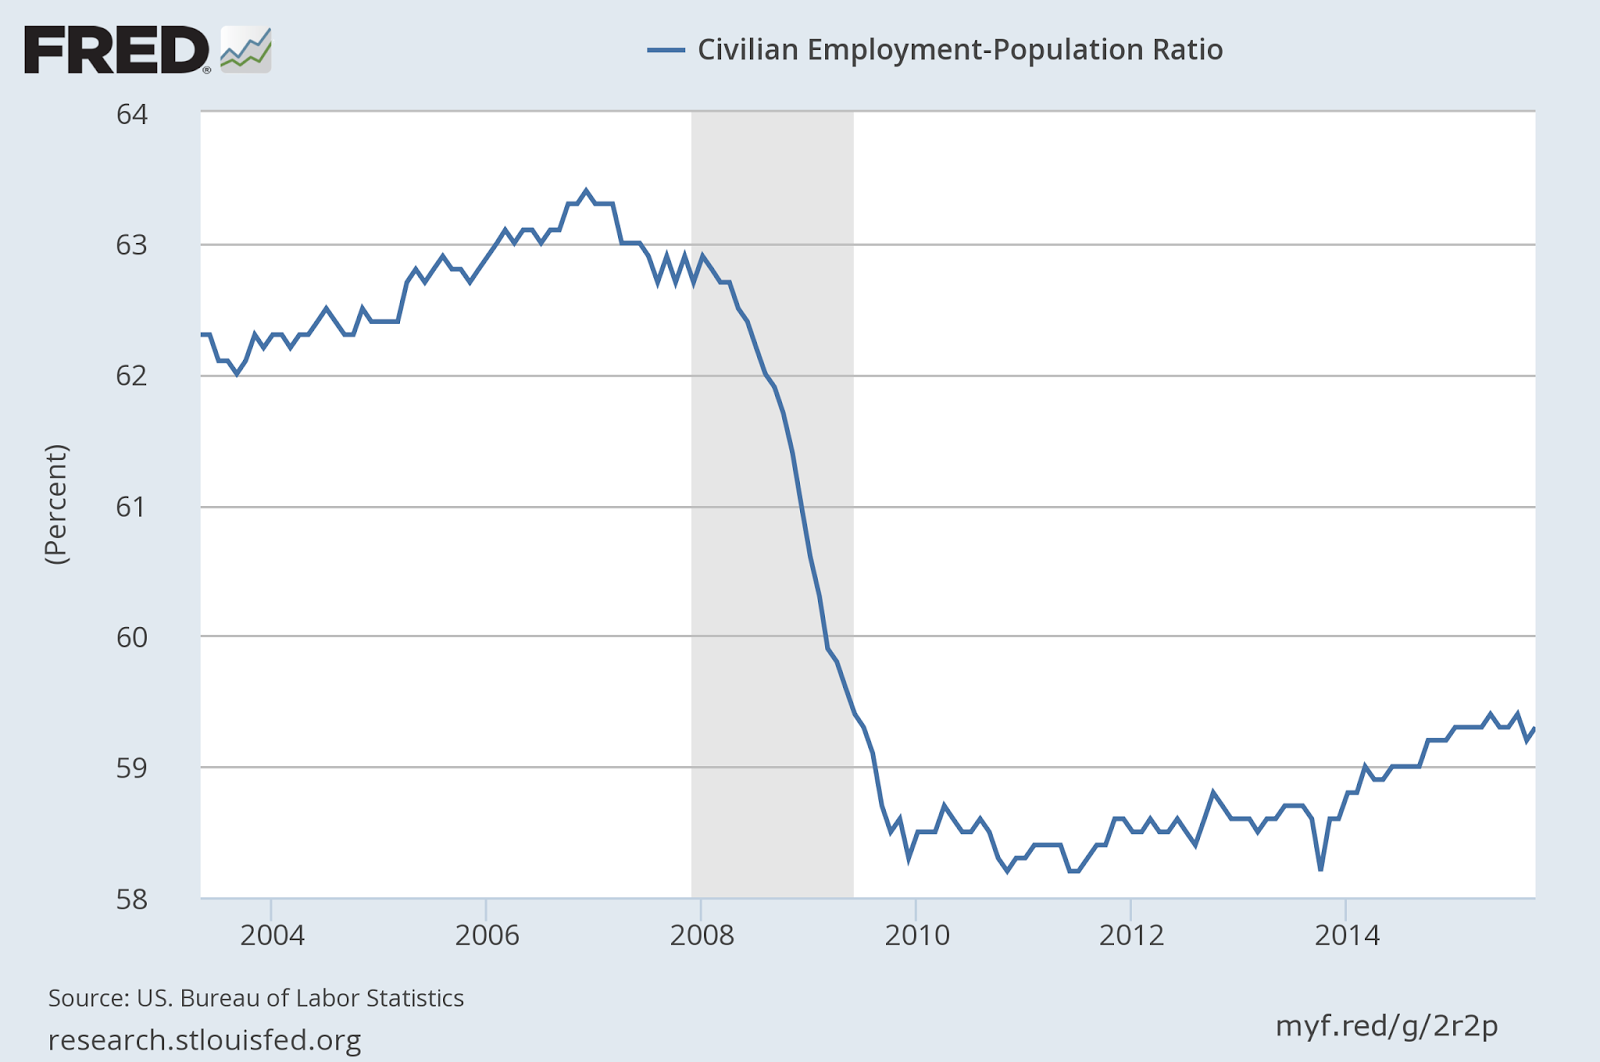 NAKED KEYNESIANISM: The labor market is still way worse